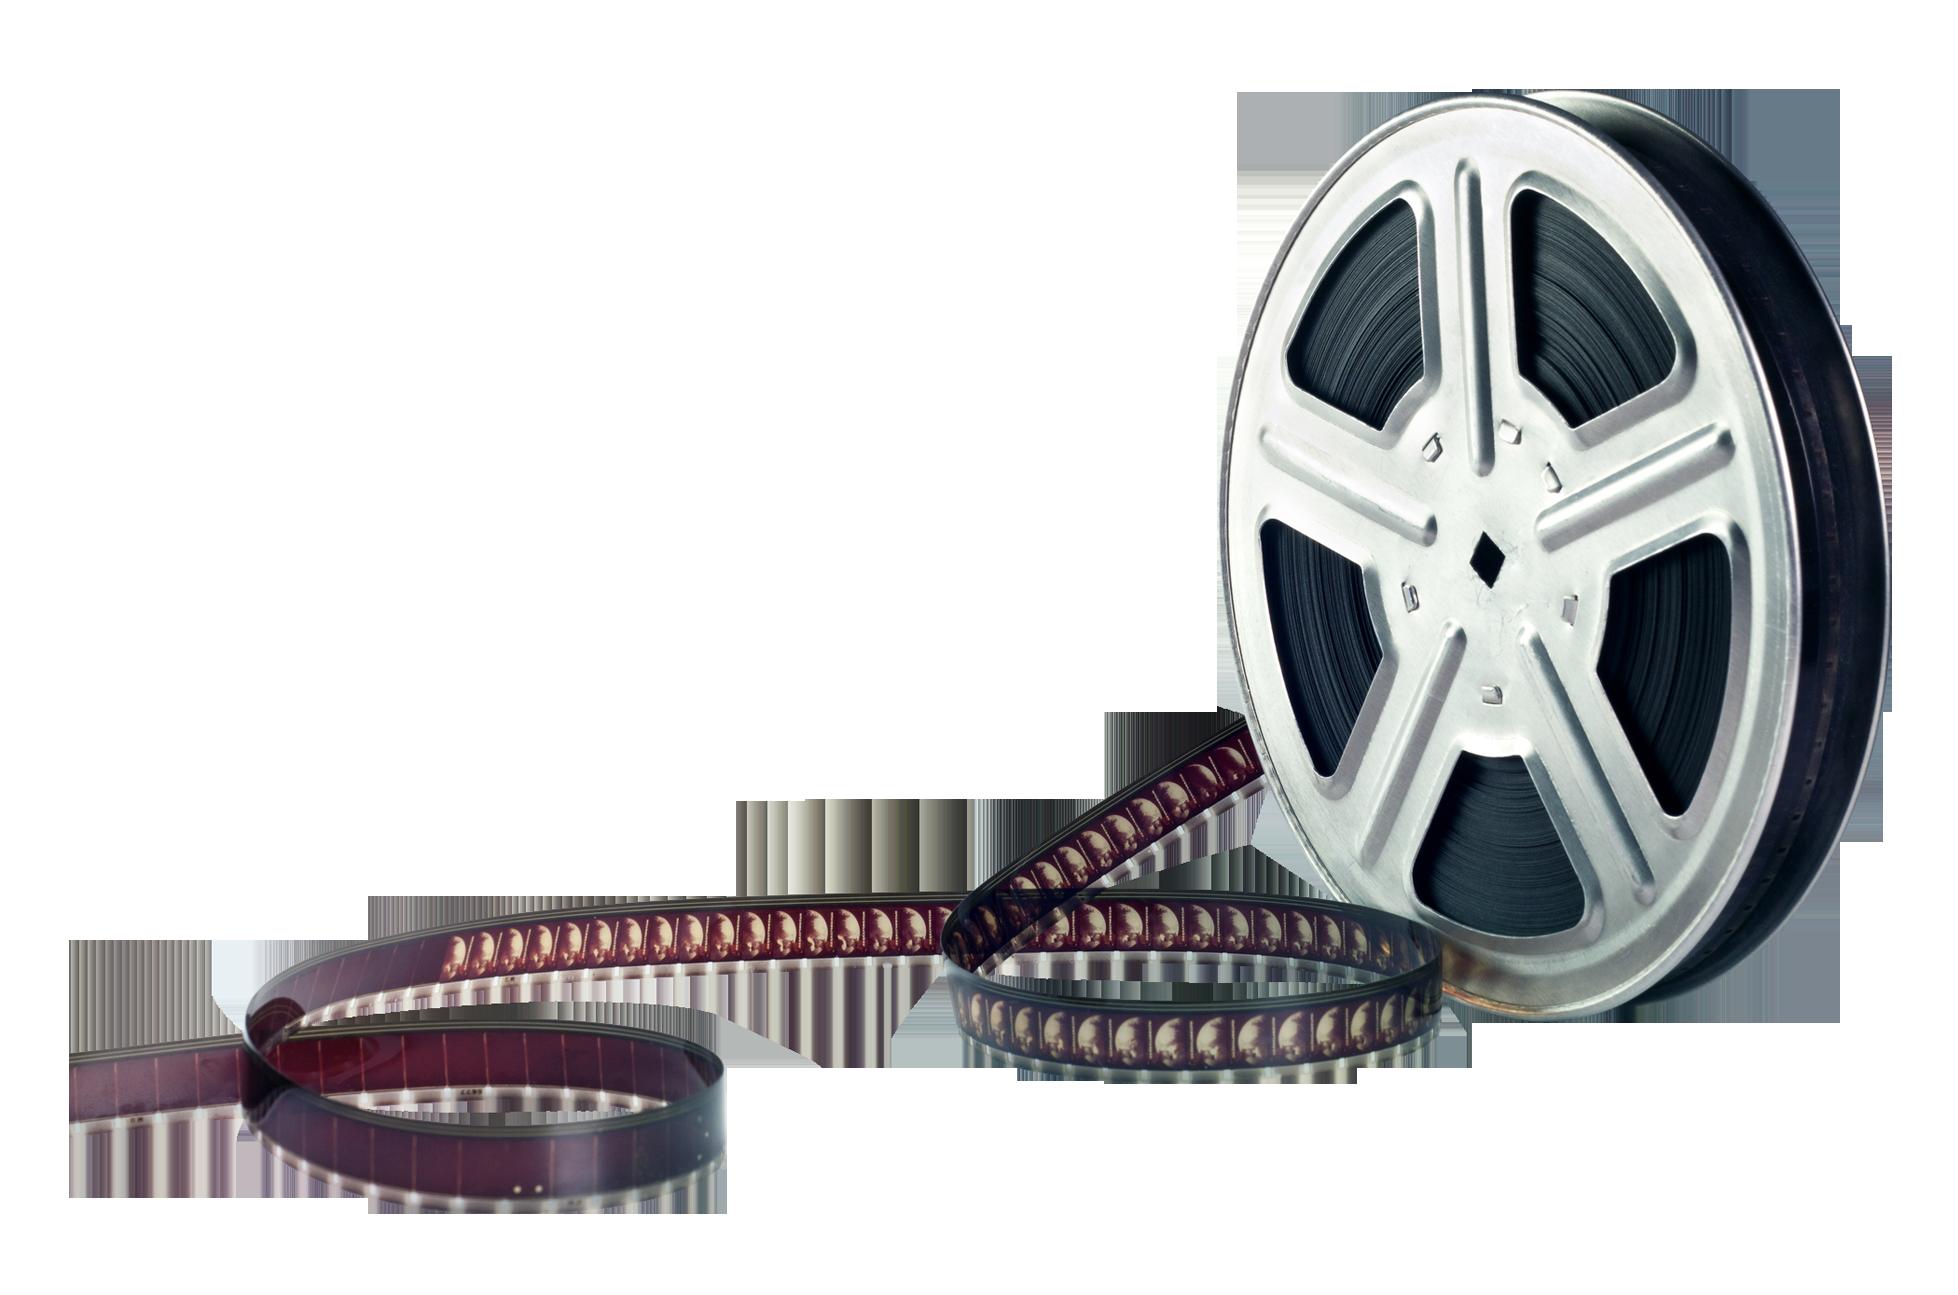 Wheel clipart movie. Film reel png image